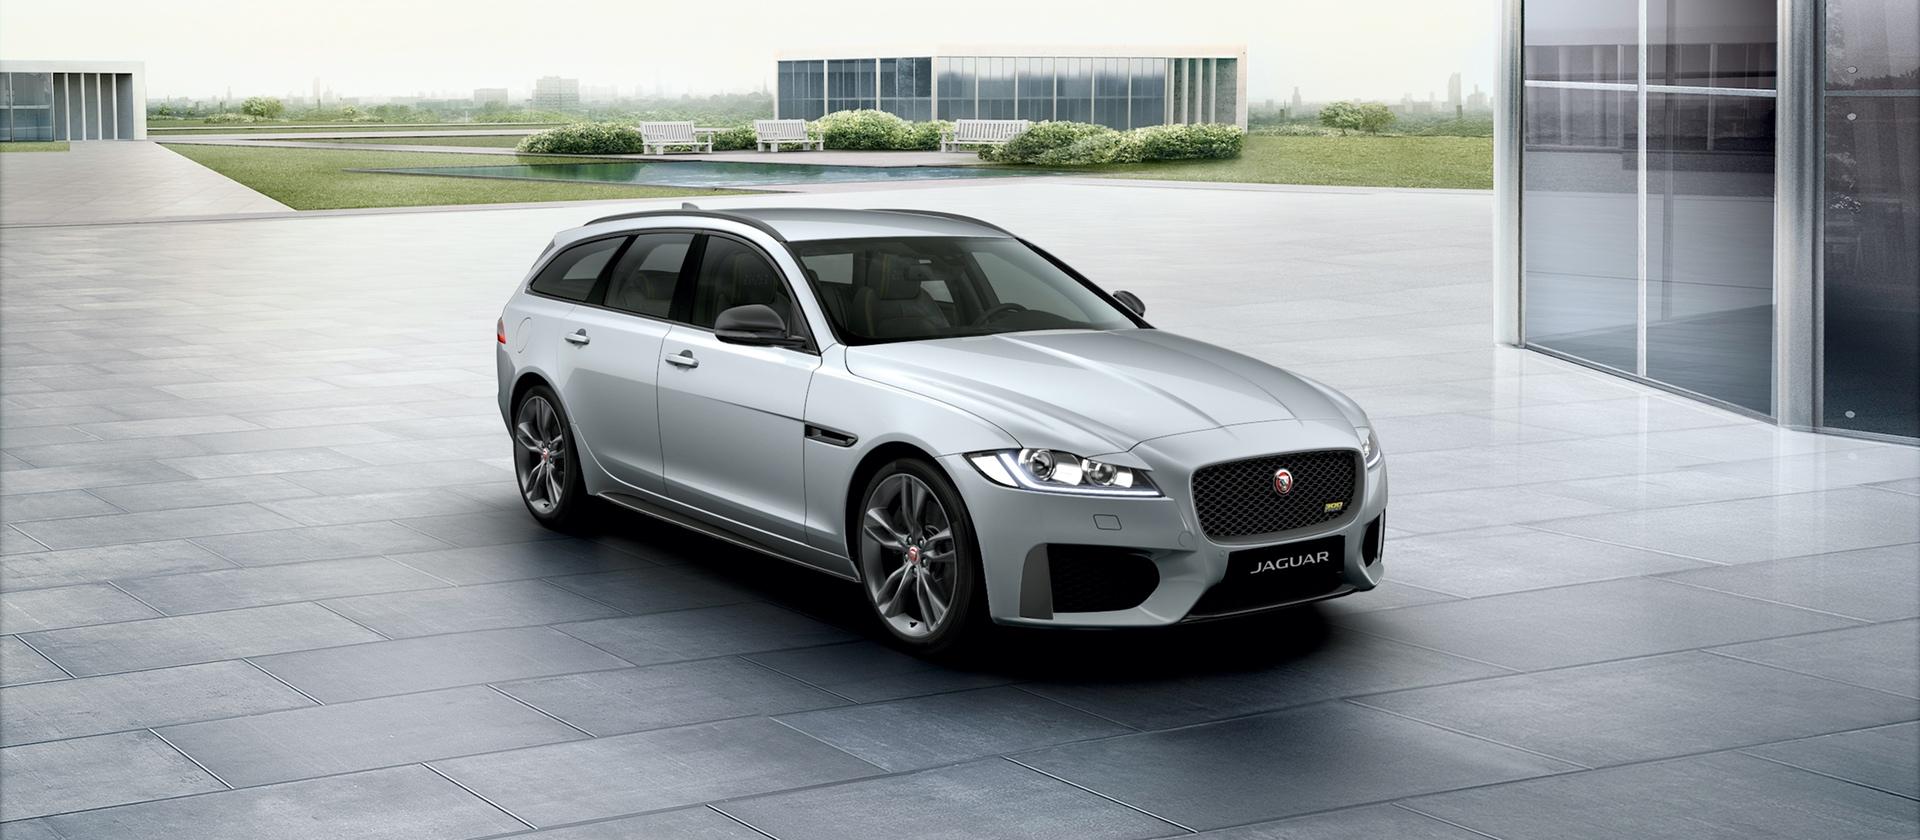 Jaguar_XF_300_Sport_0005